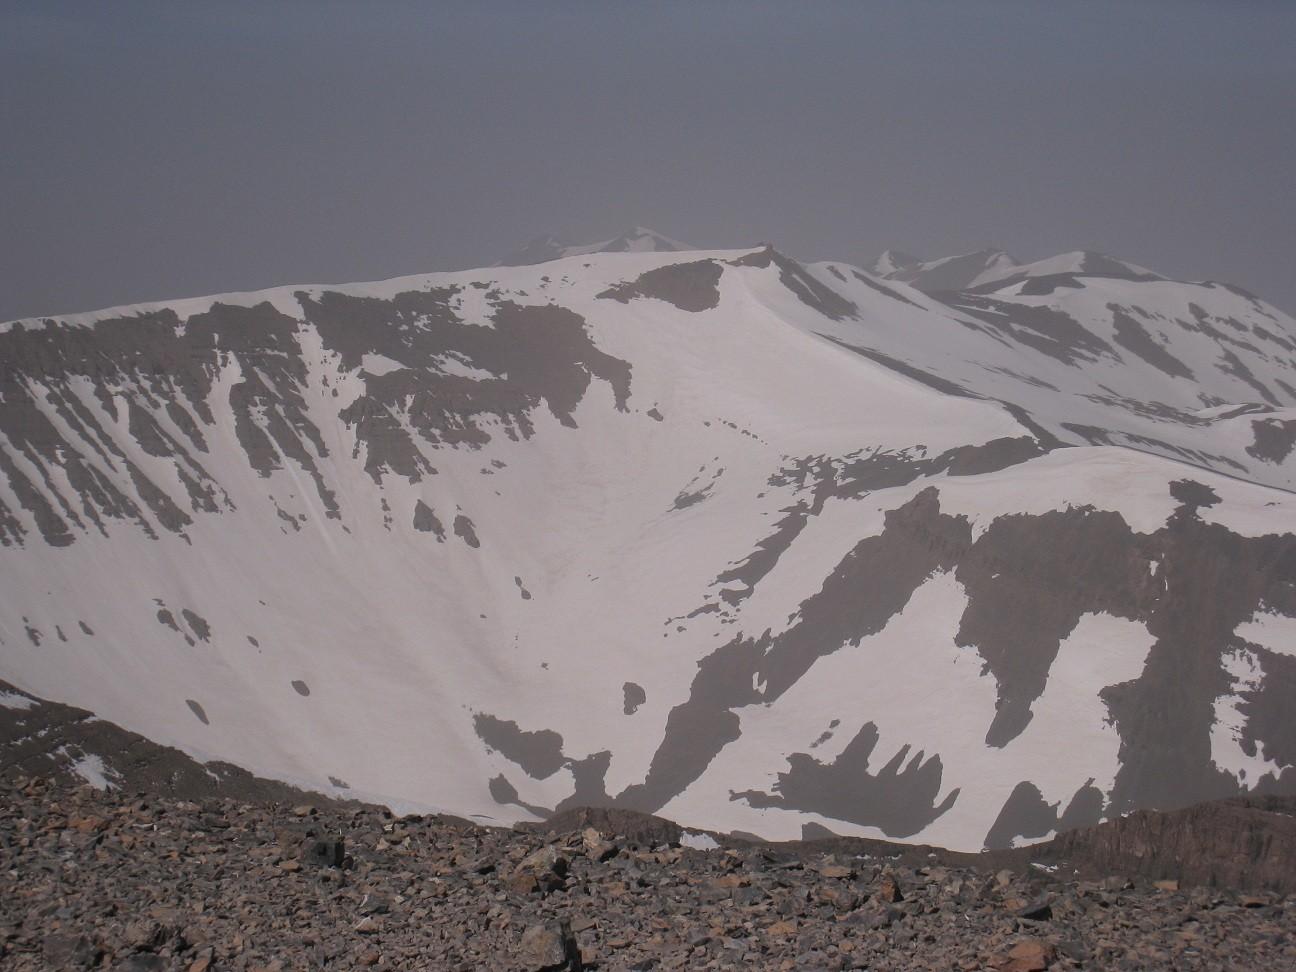 Djebel M'Goun(4068m) - arête sommitale